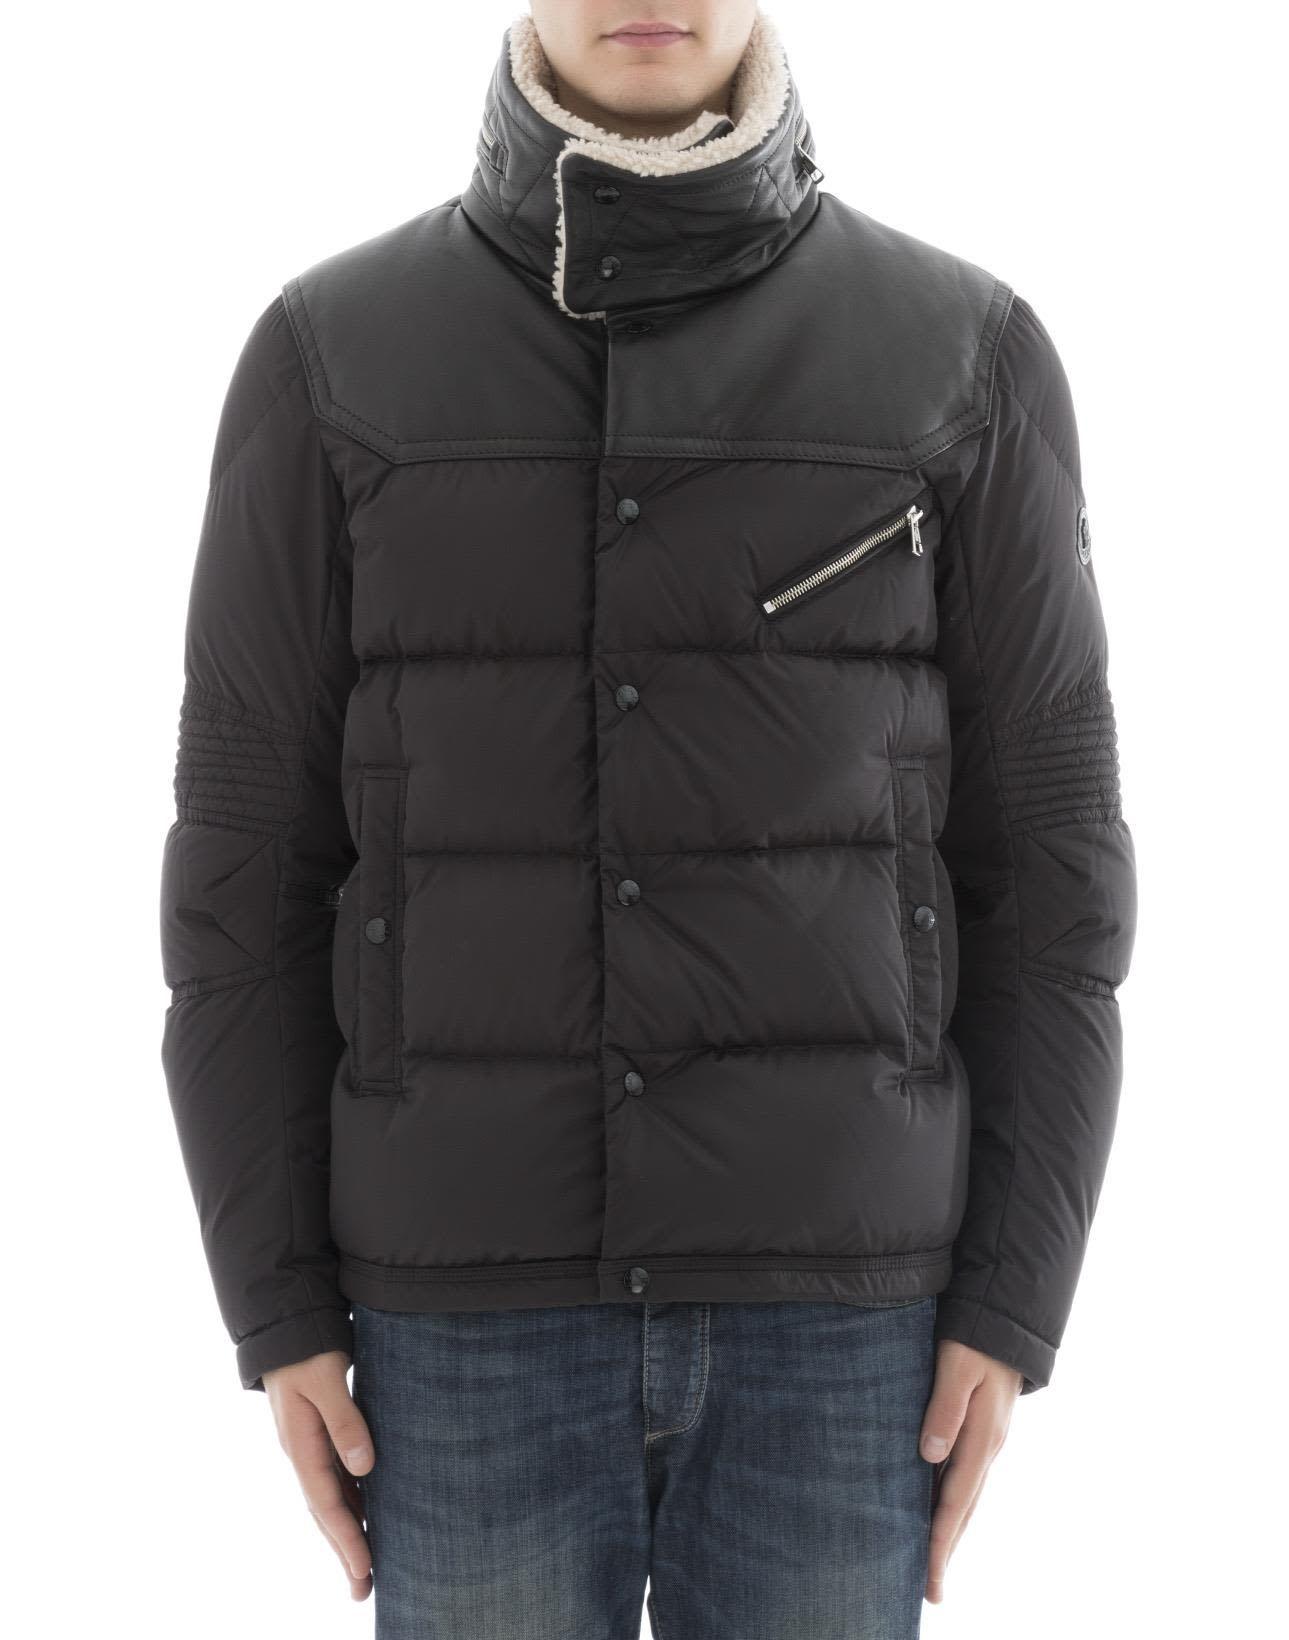 Moncler Black Poliamide Jacket ModeSens Jackets